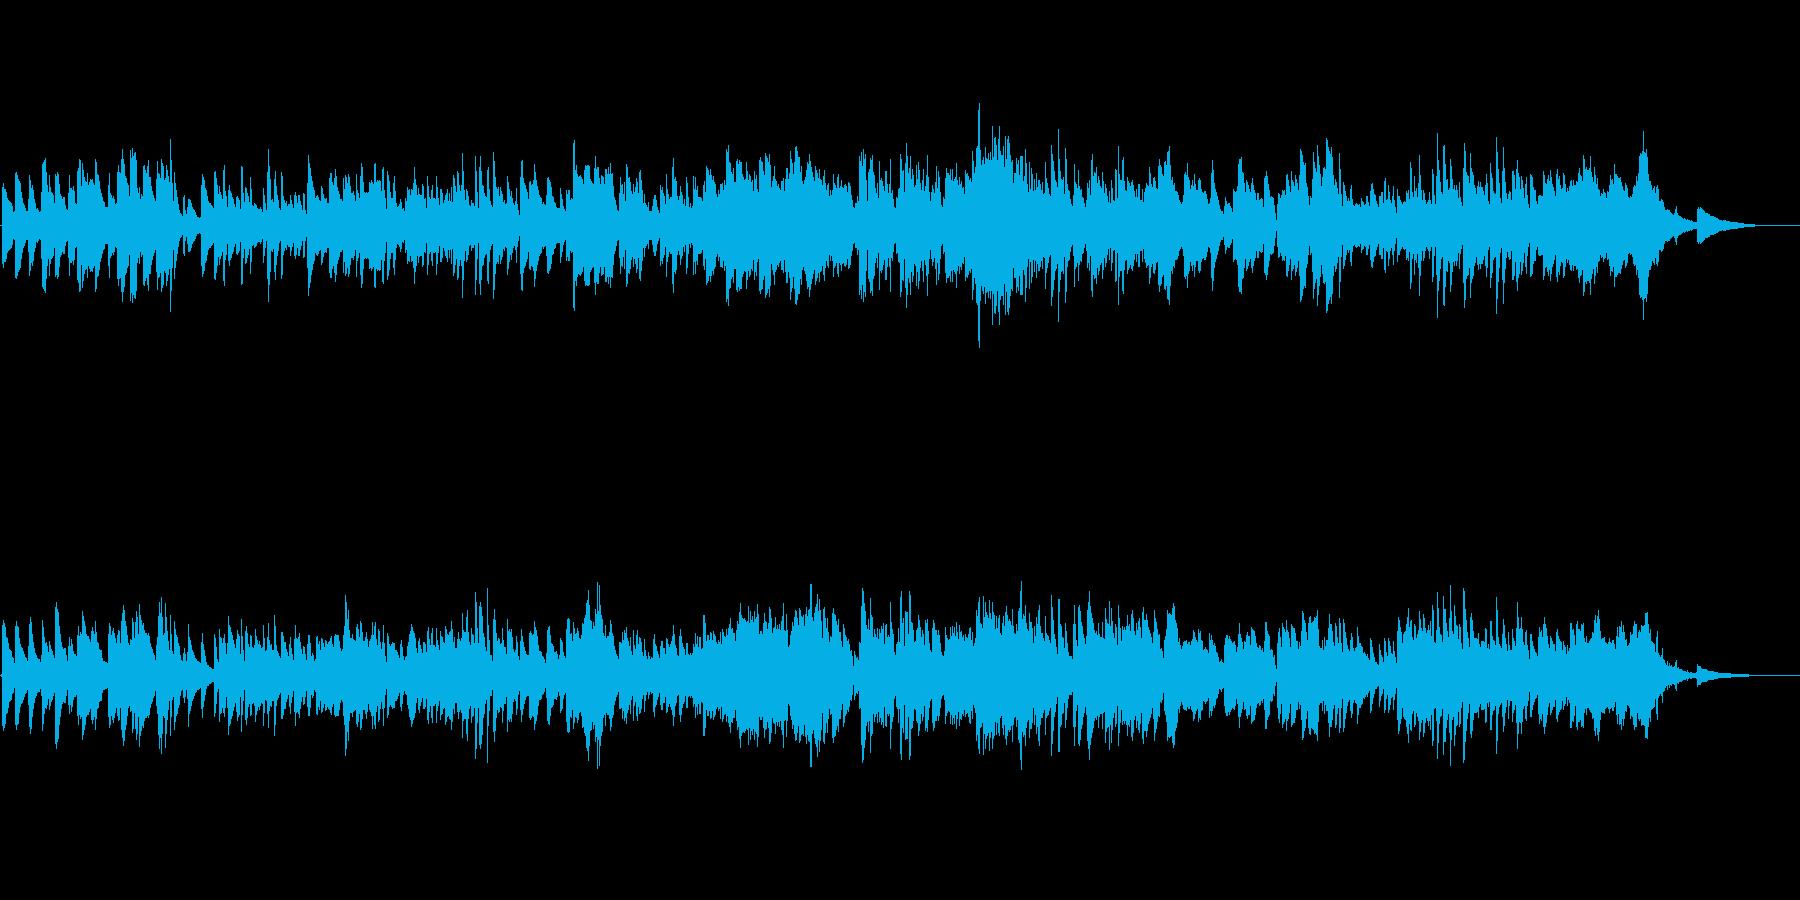 Mellow piano jazz waltz's reproduced waveform